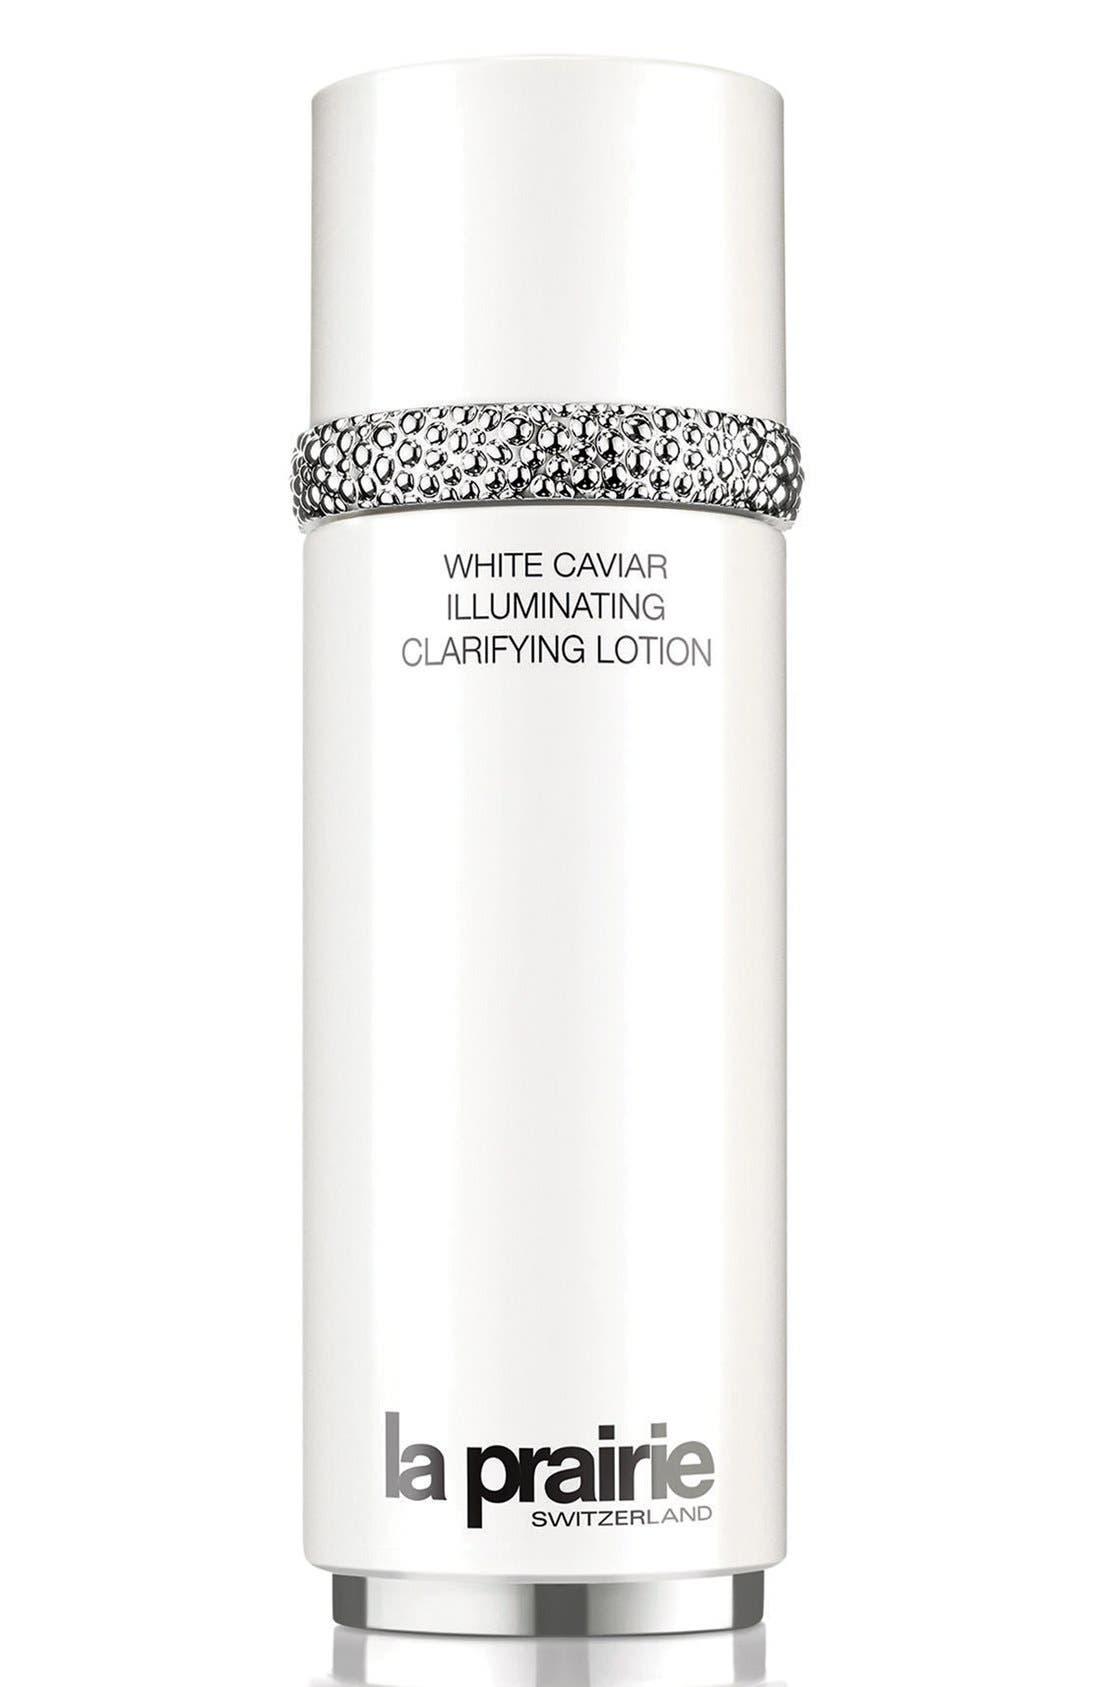 LA PRAIRIE,                             White Caviar Illuminating Clarifying Lotion,                             Main thumbnail 1, color,                             NO COLOR